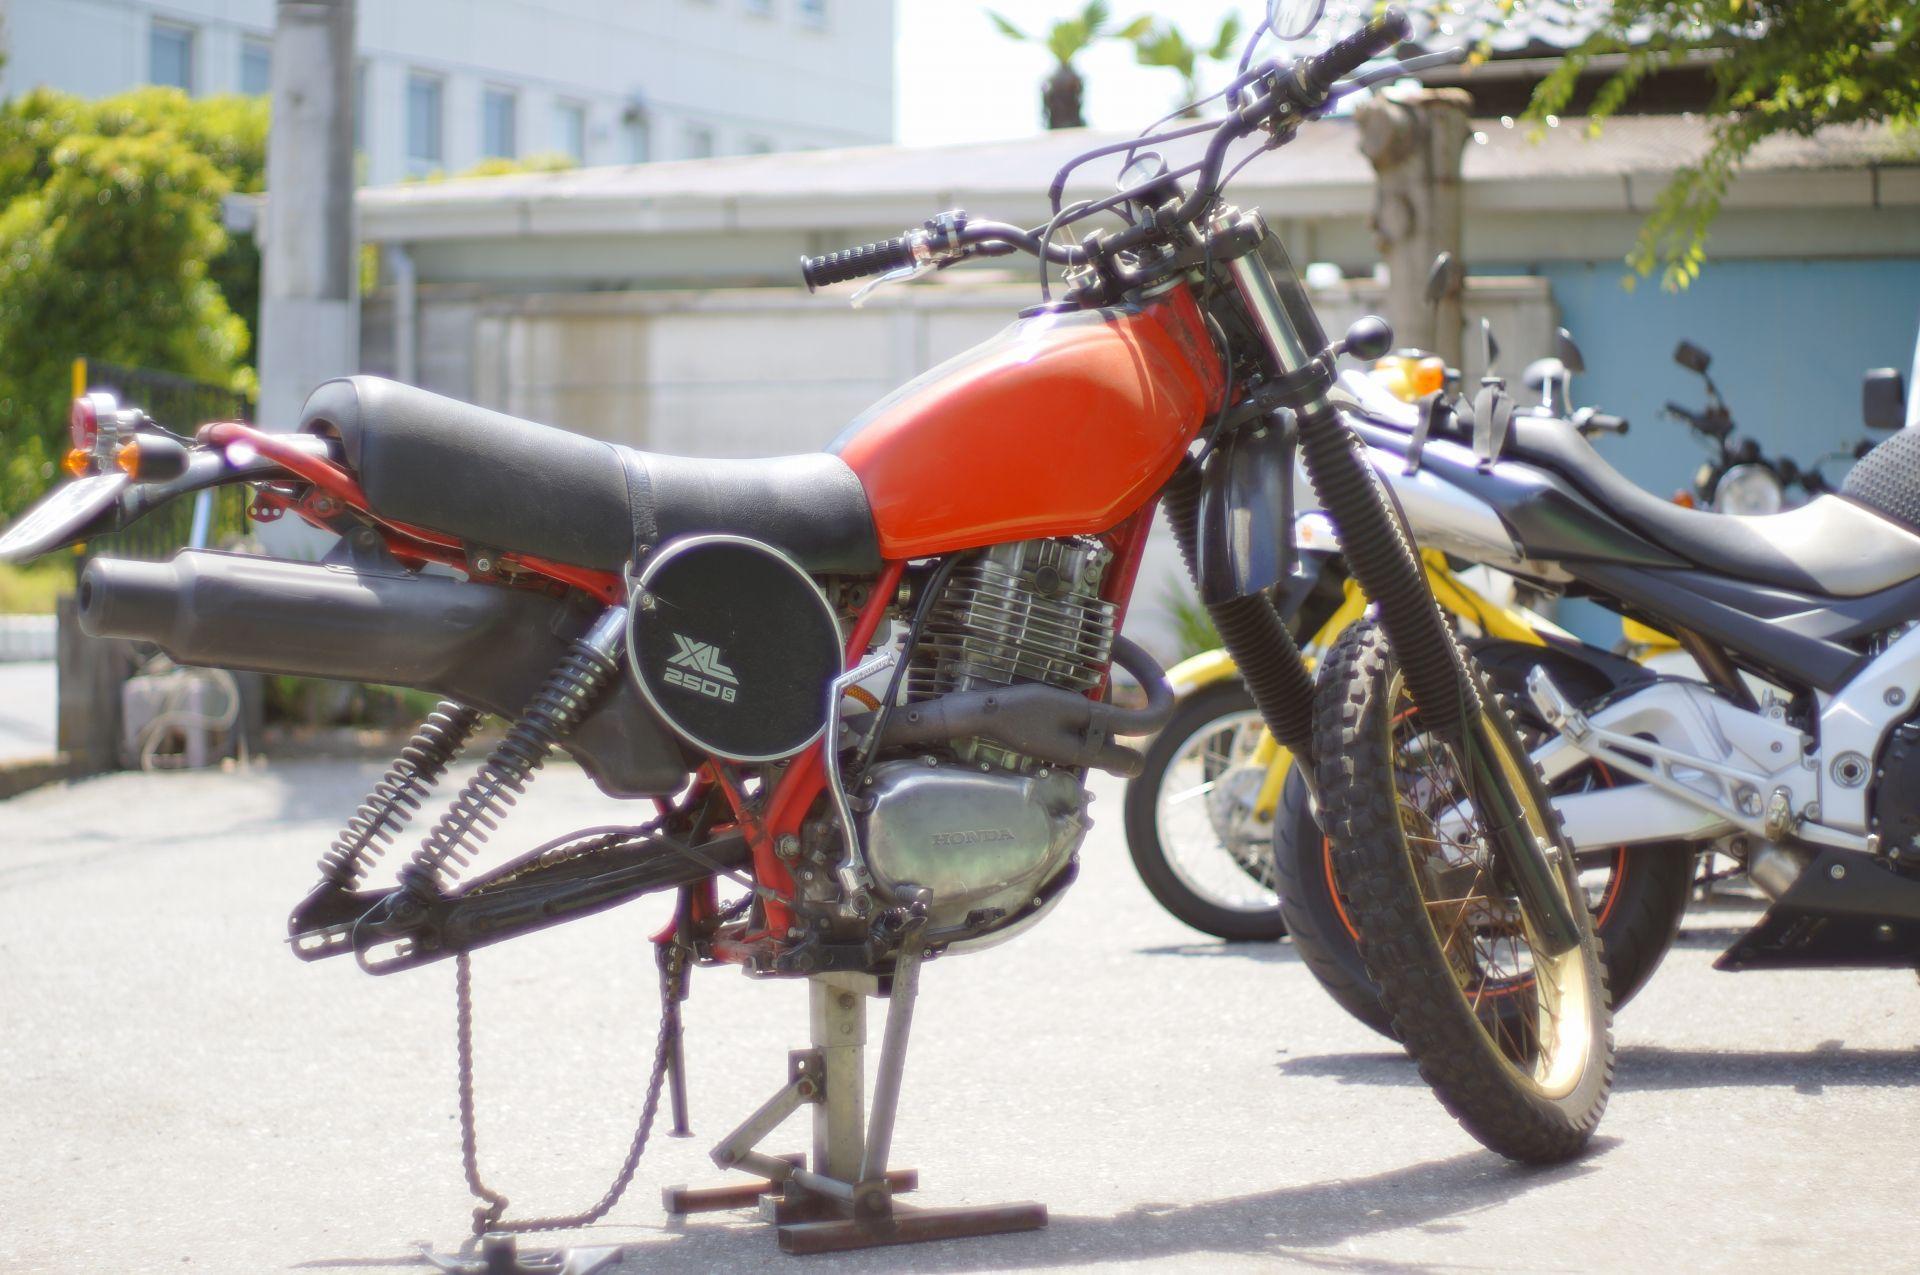 XL250s